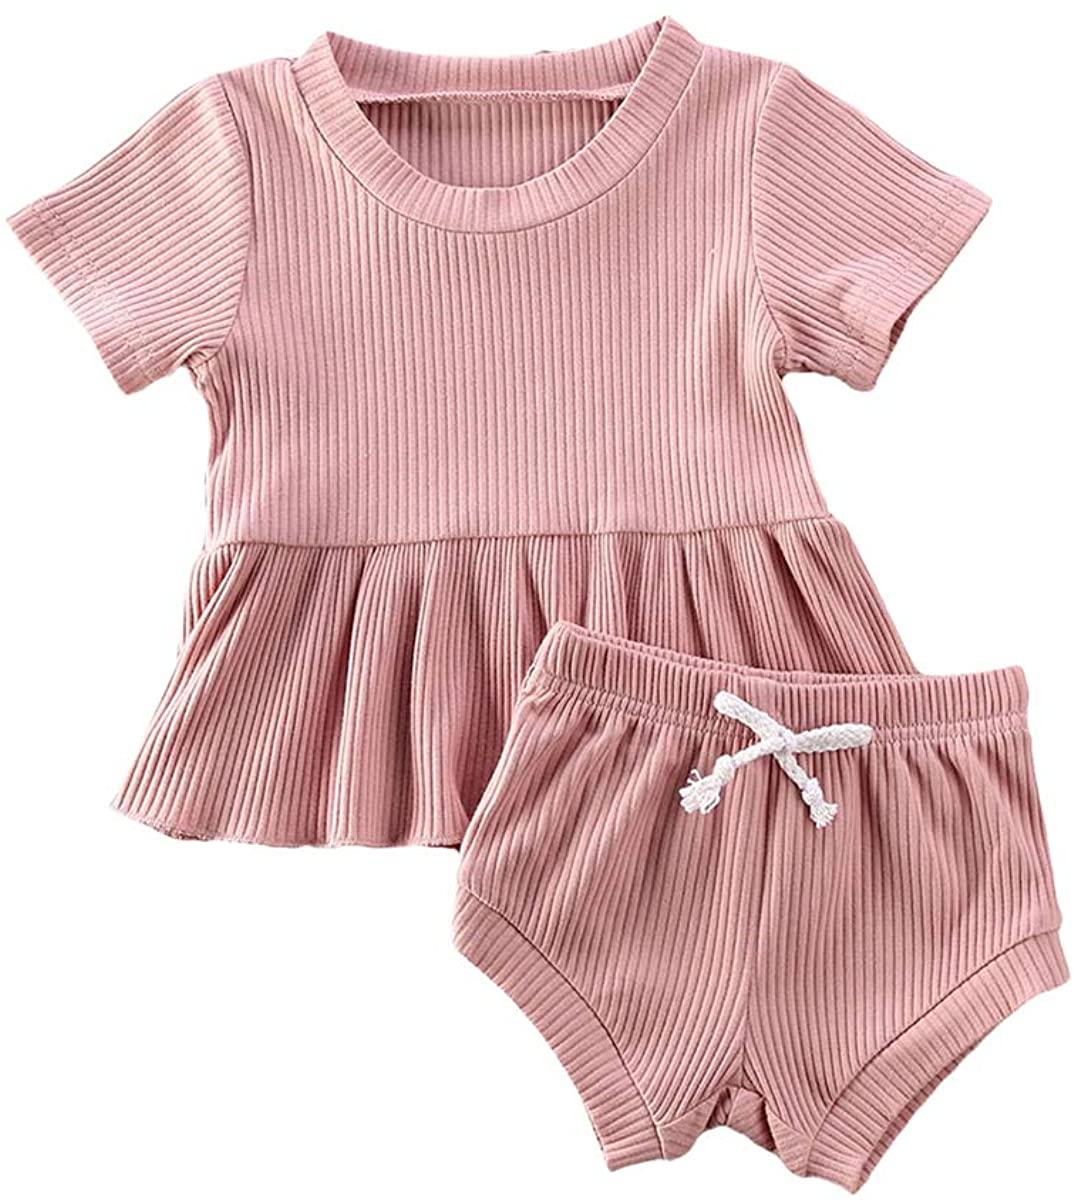 Newborn Infant Baby Girl Clothes Set Solid Ruffle Dress Shirts Tees Tops Shorts 2PCS Ribbed Toddler Girl Outfits Set